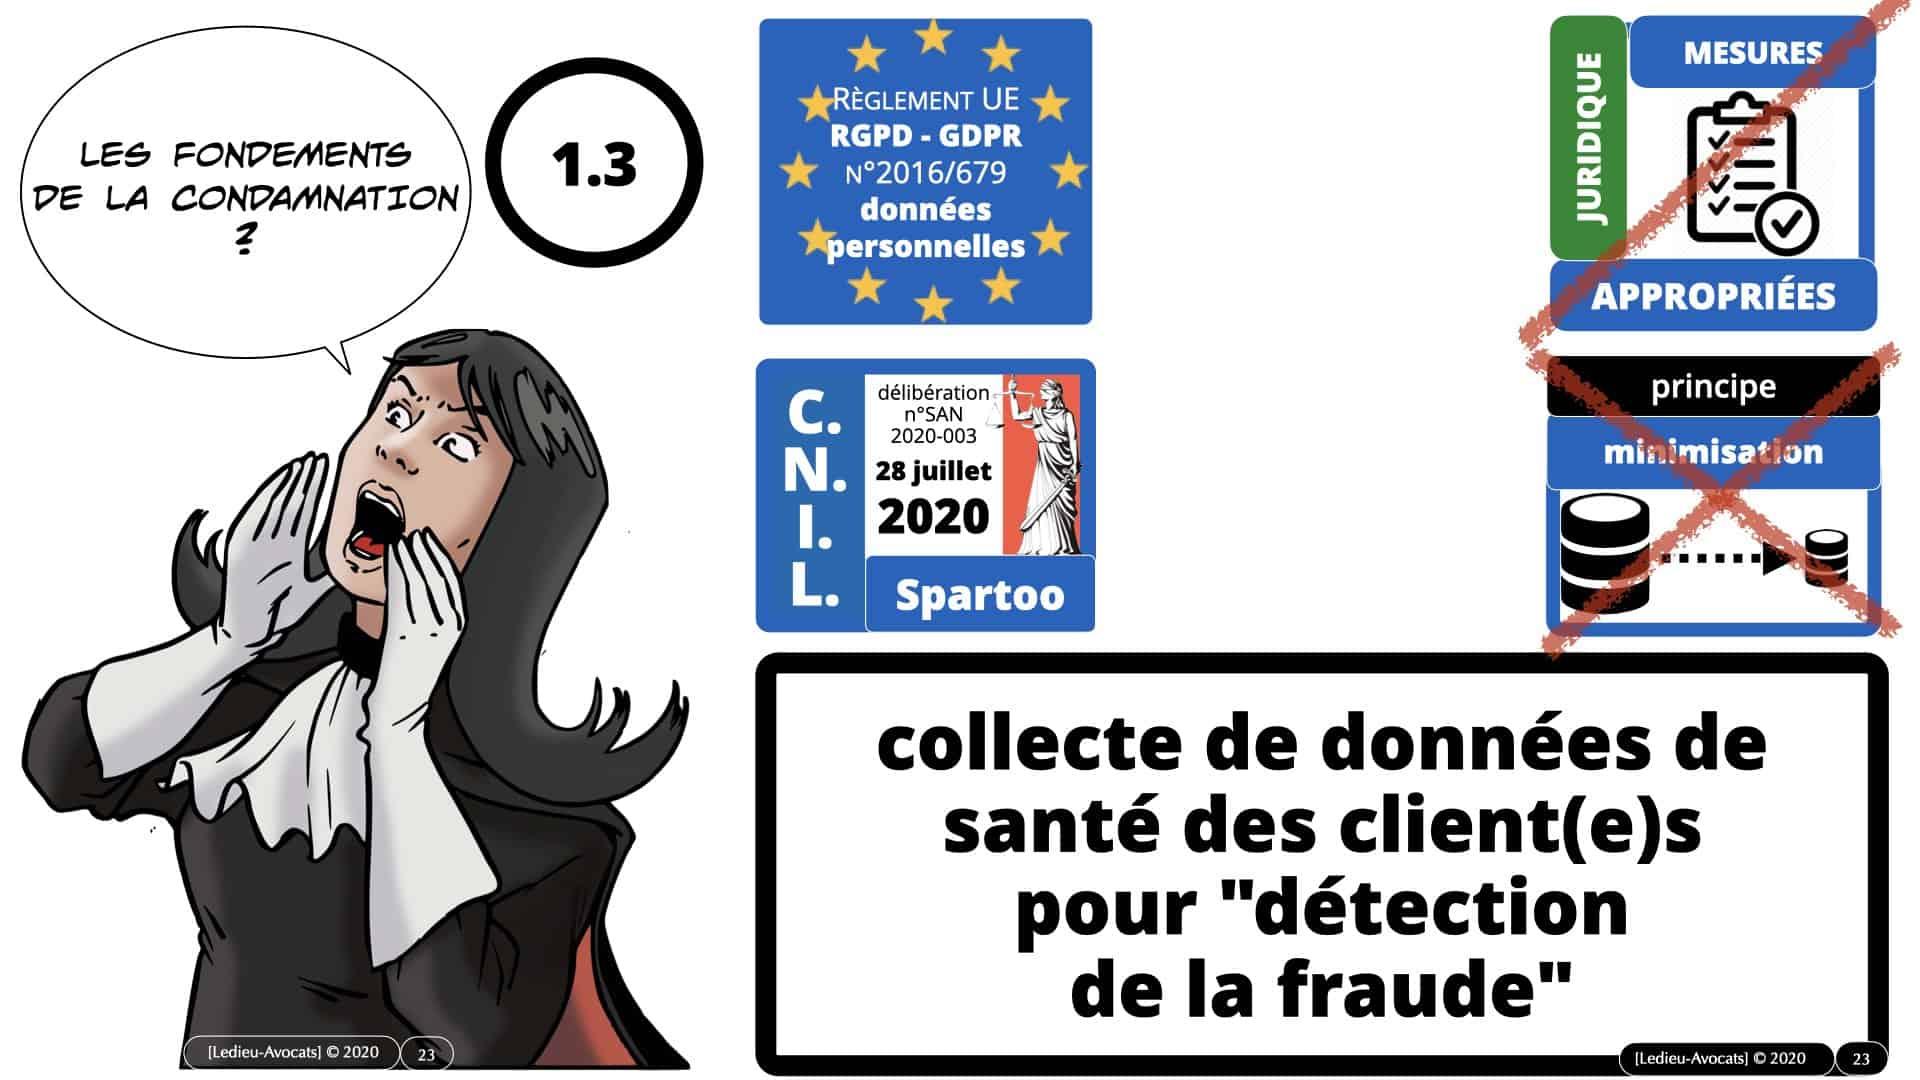 RGPD délibération CNIL Spartoo du 28 juillet 2020 n°SAN 2020-003 MOTIF 03